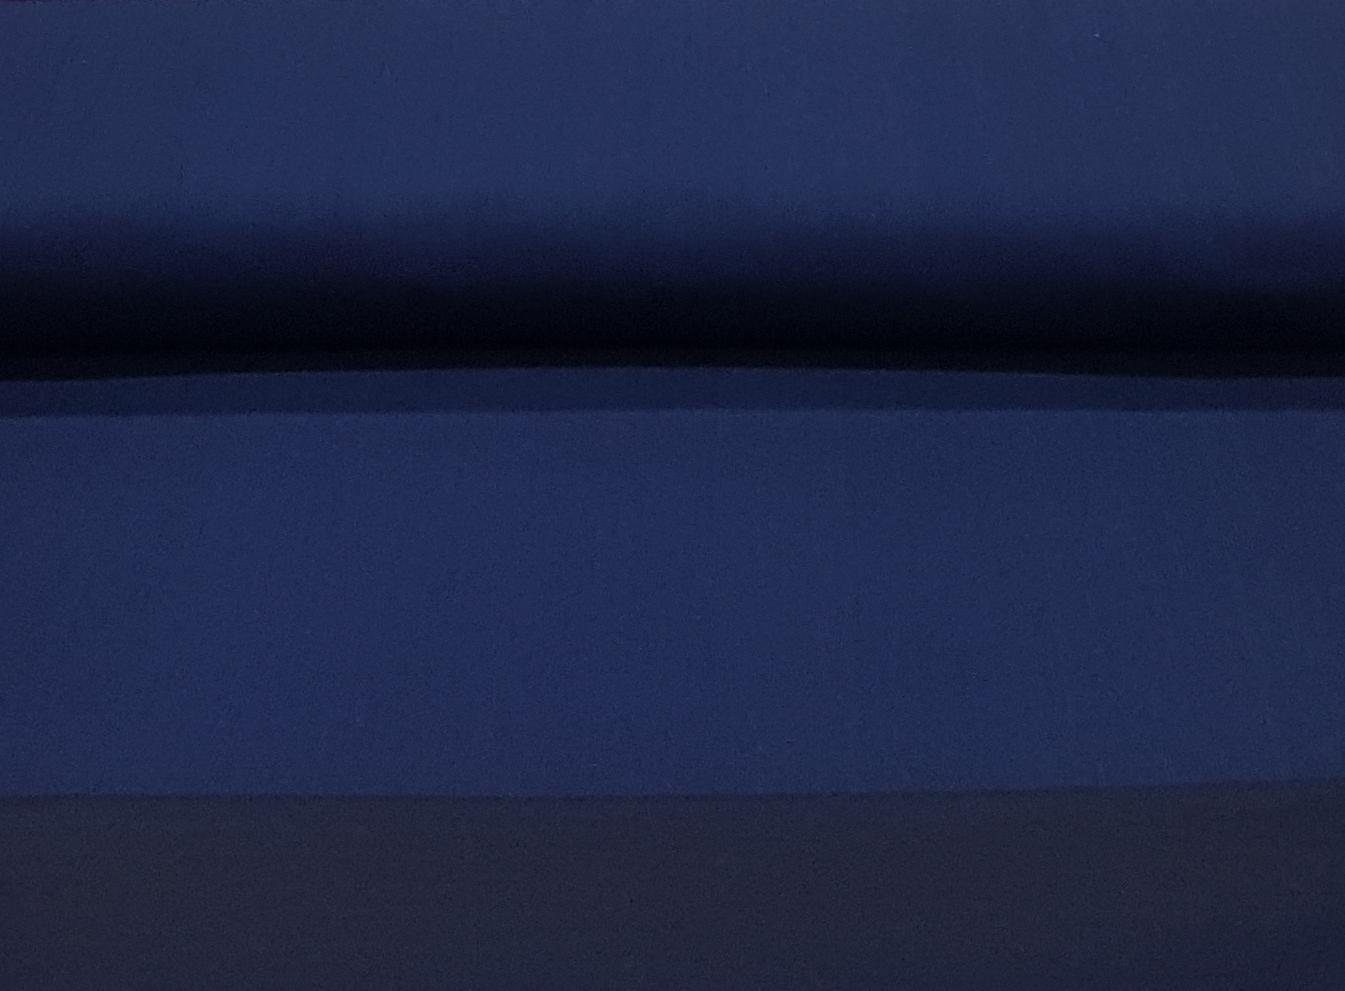 stretchdenimkobaltblauw